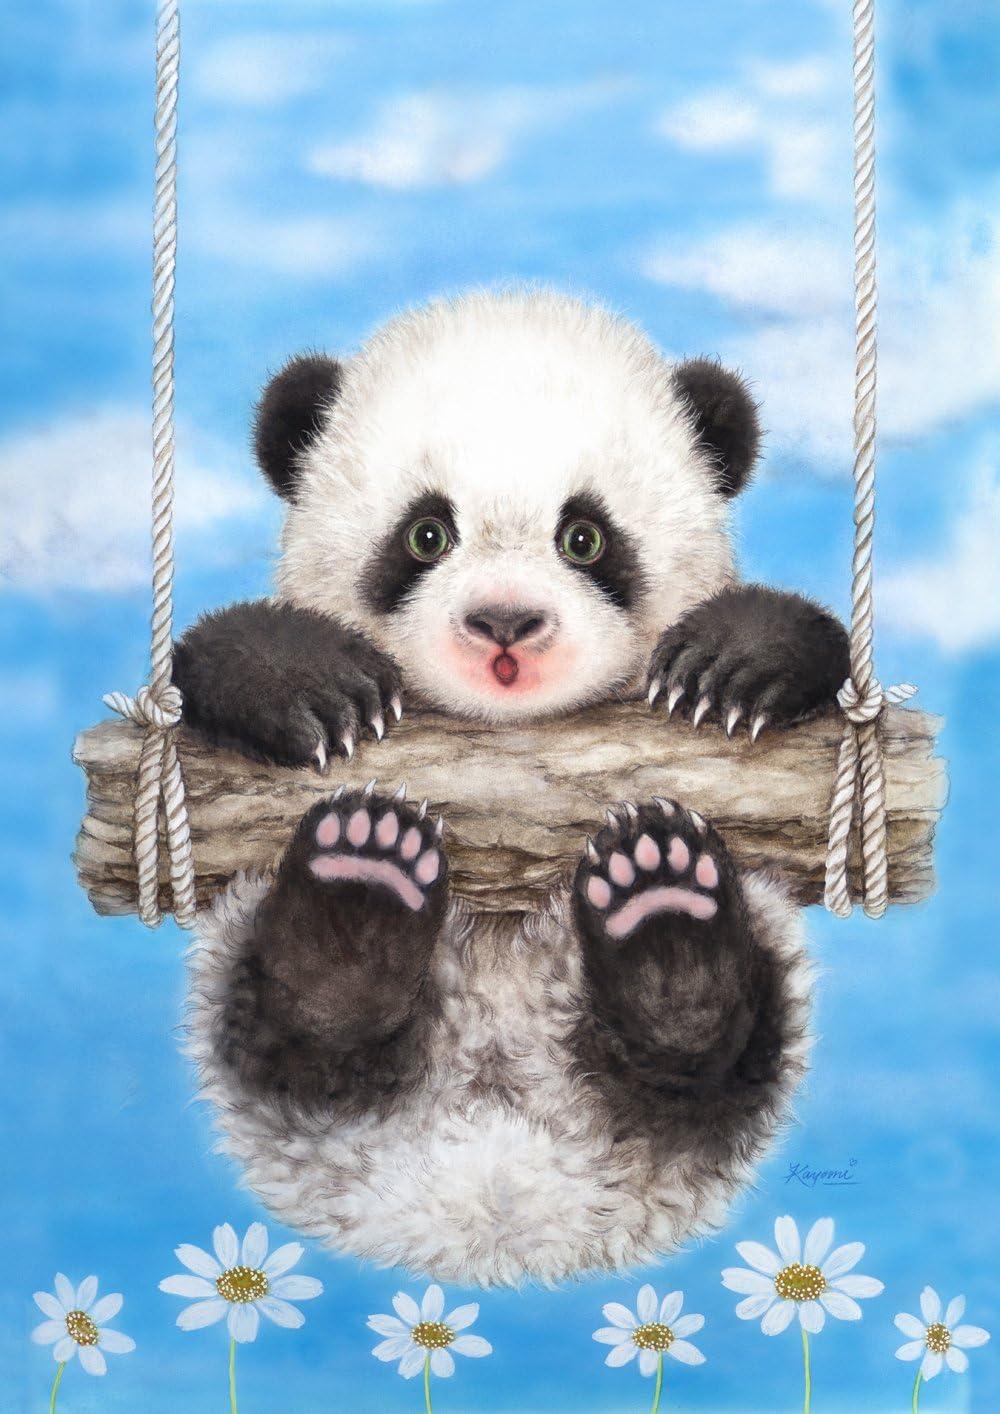 Toland Home Garden Panda Playtime 12.5 x 18 Inch Decorative Cute Cuddly Summer Daisy Swing Garden Flag